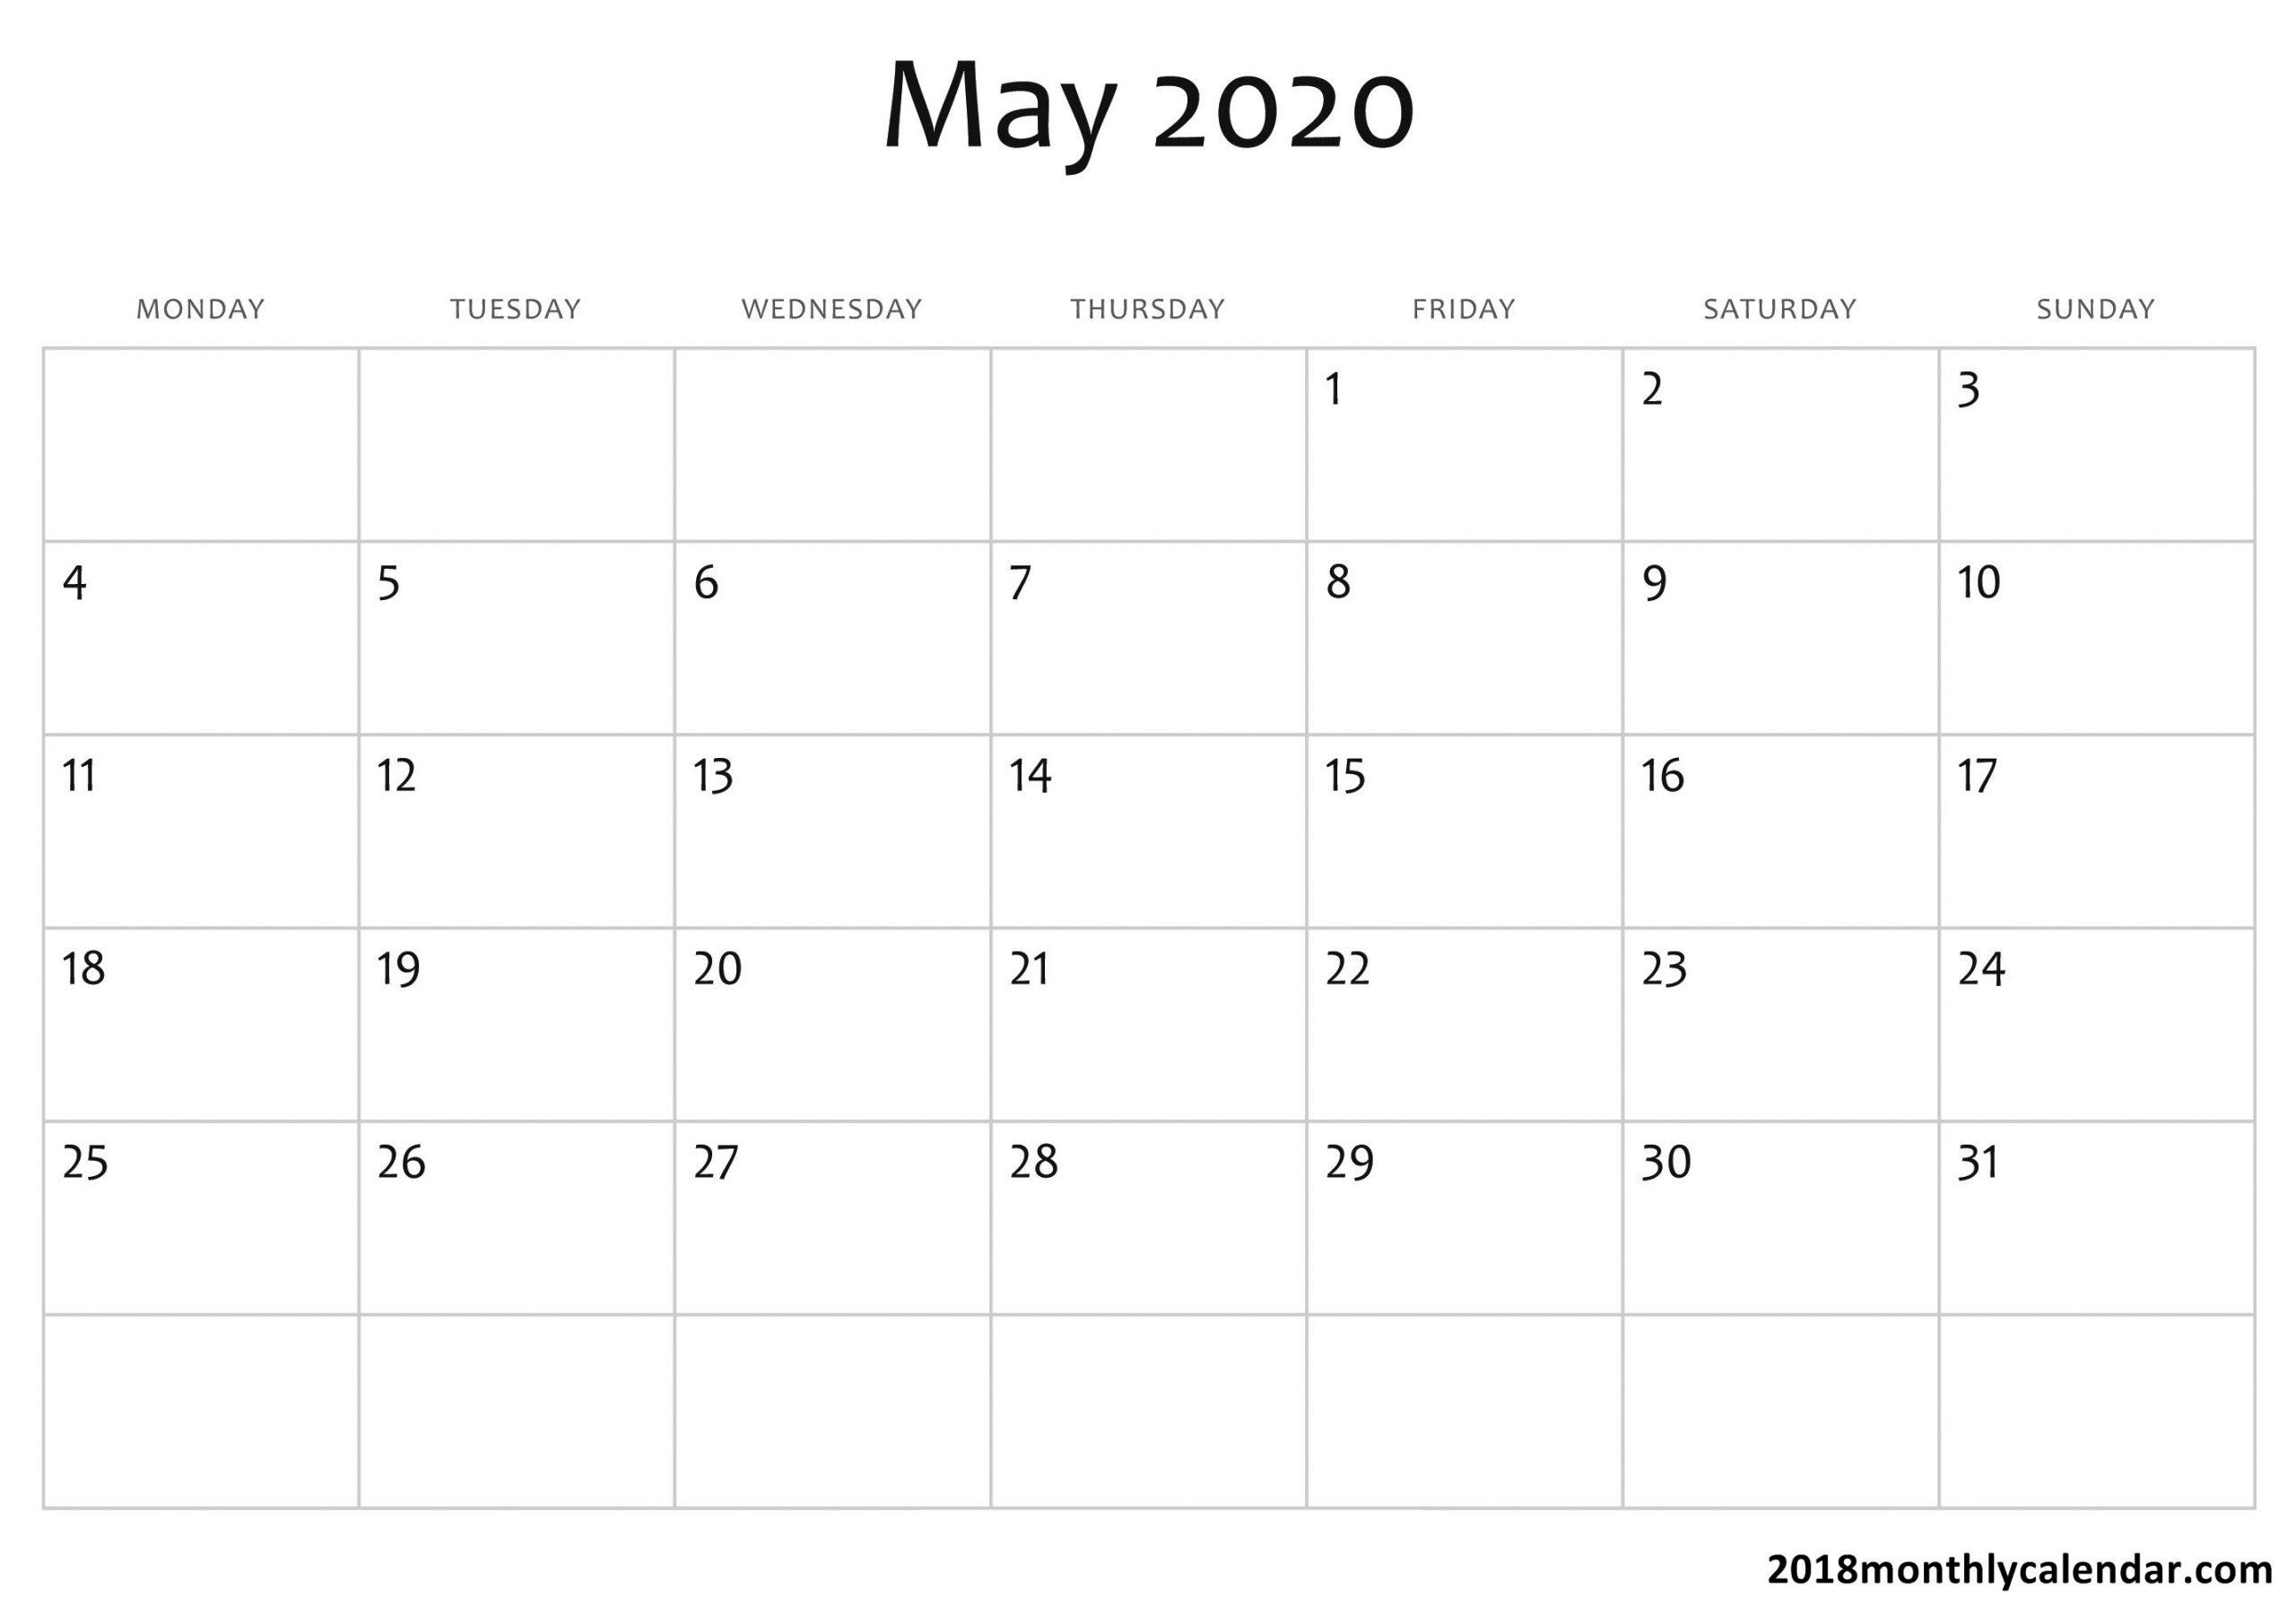 2020 Calender I Can Edit | Calendar Template Printable Calanda Templete That I Can Edit